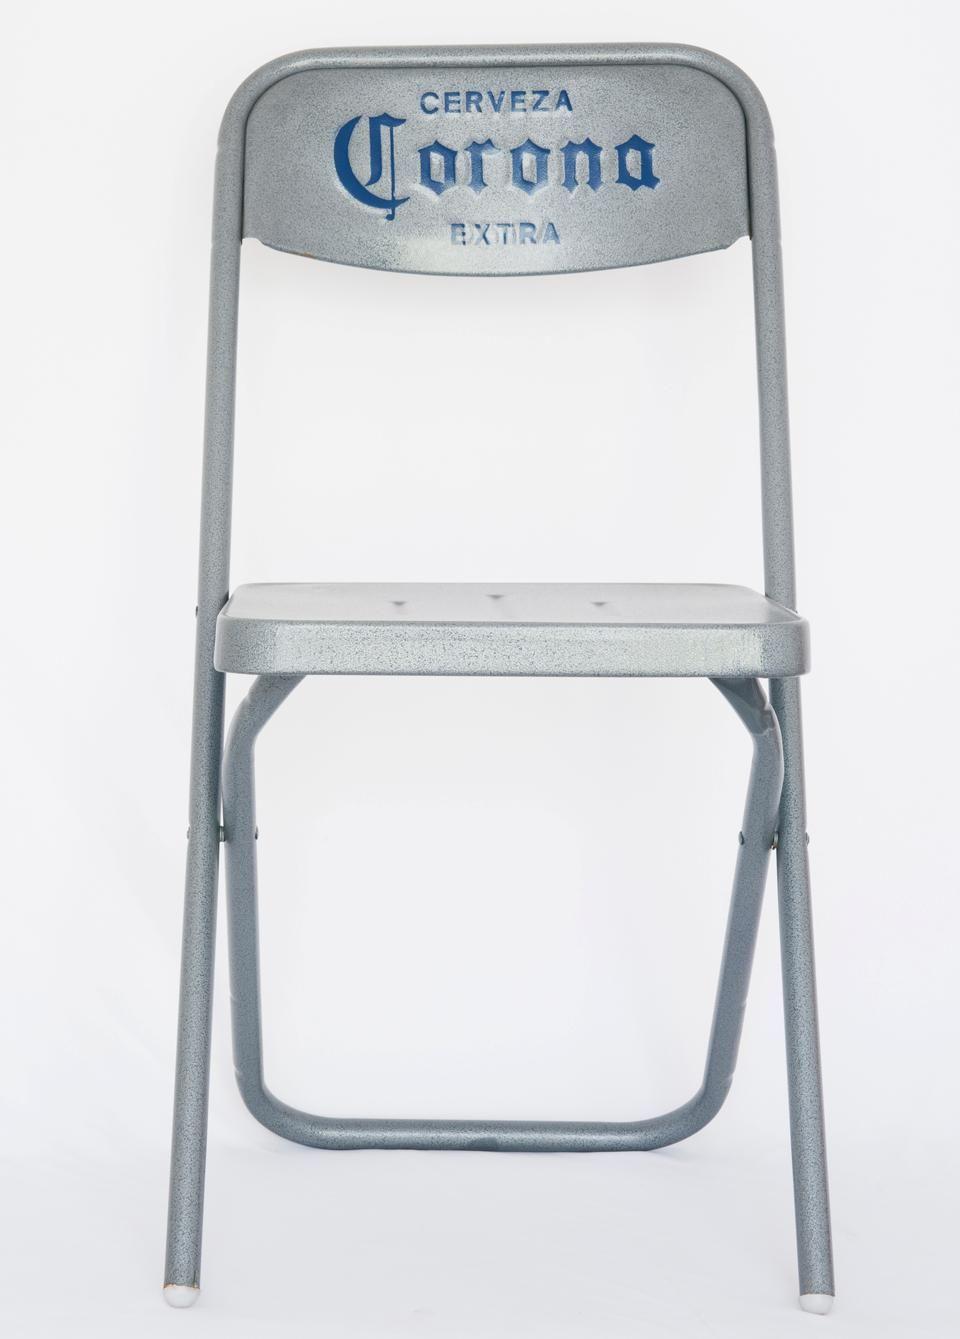 sillas de la.corona - Google Search | La Calle | Pinterest | Sumo ...